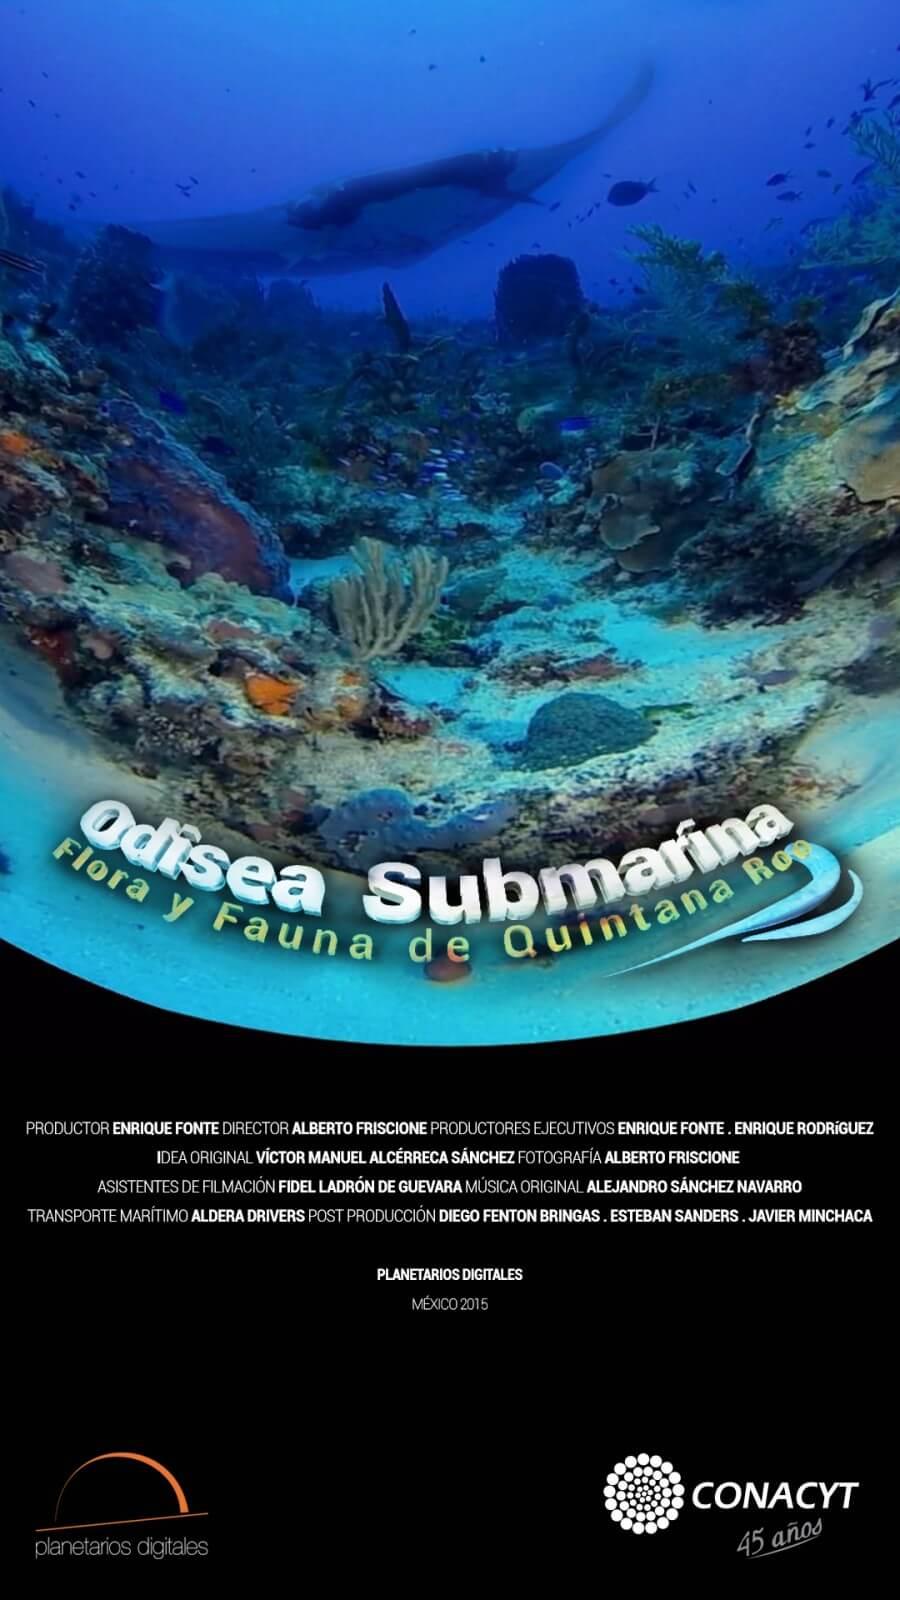 Submarine Odyssey: Flora and fauna of Quintana Roo